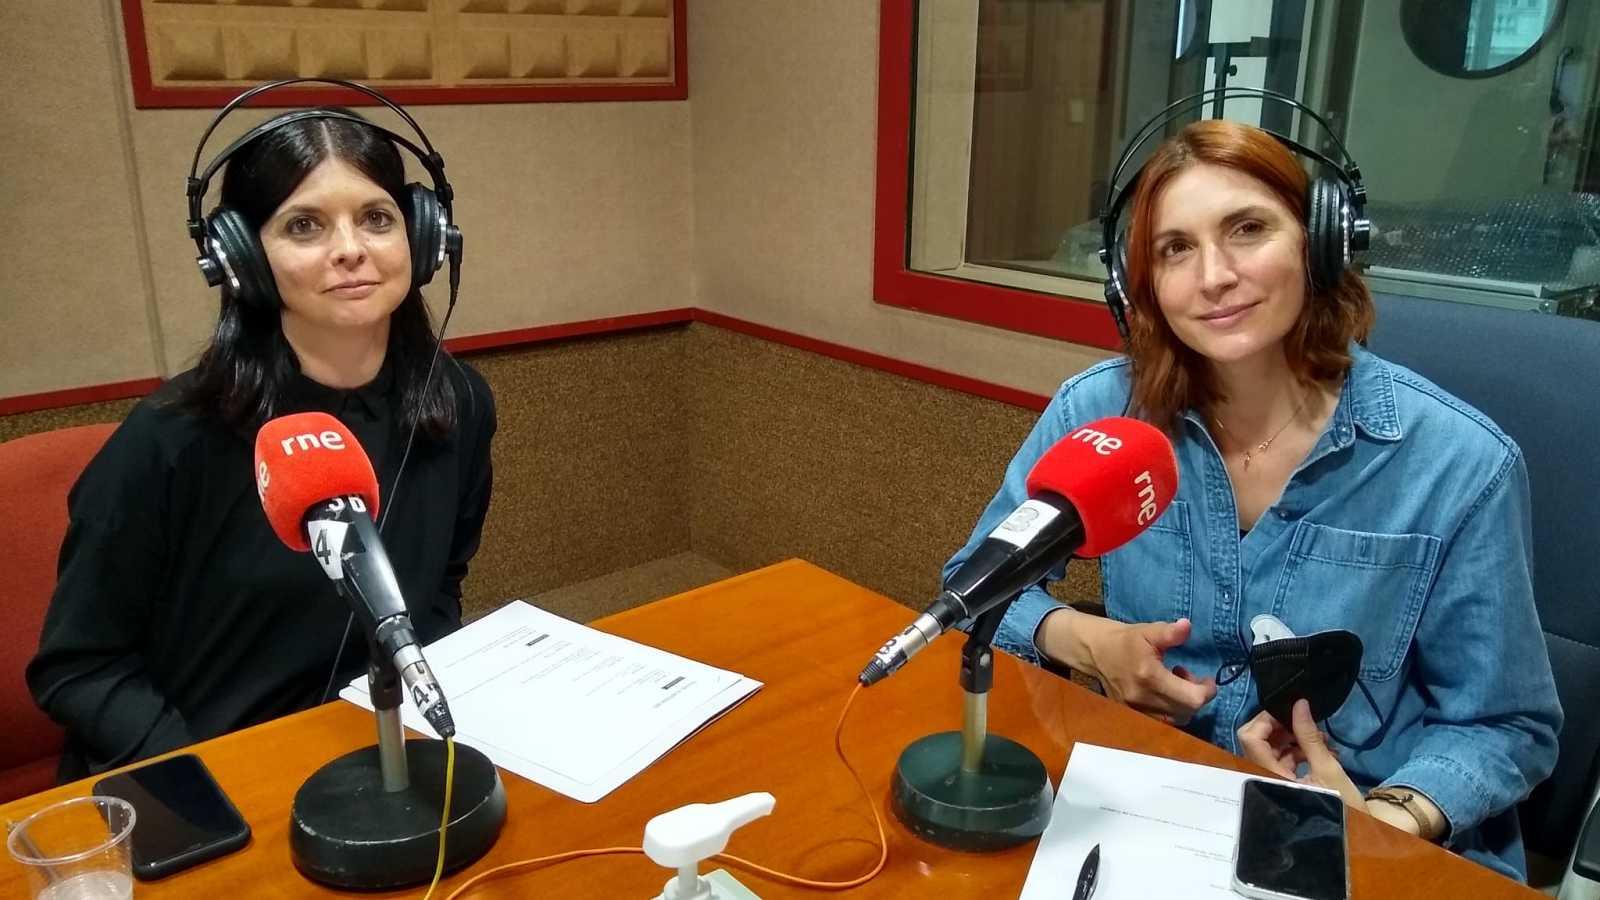 La sala - Festival 10 Sentidos de Valencia: Meritxell Barberá e Inma García - 24/04/21 - Escuchar ahora